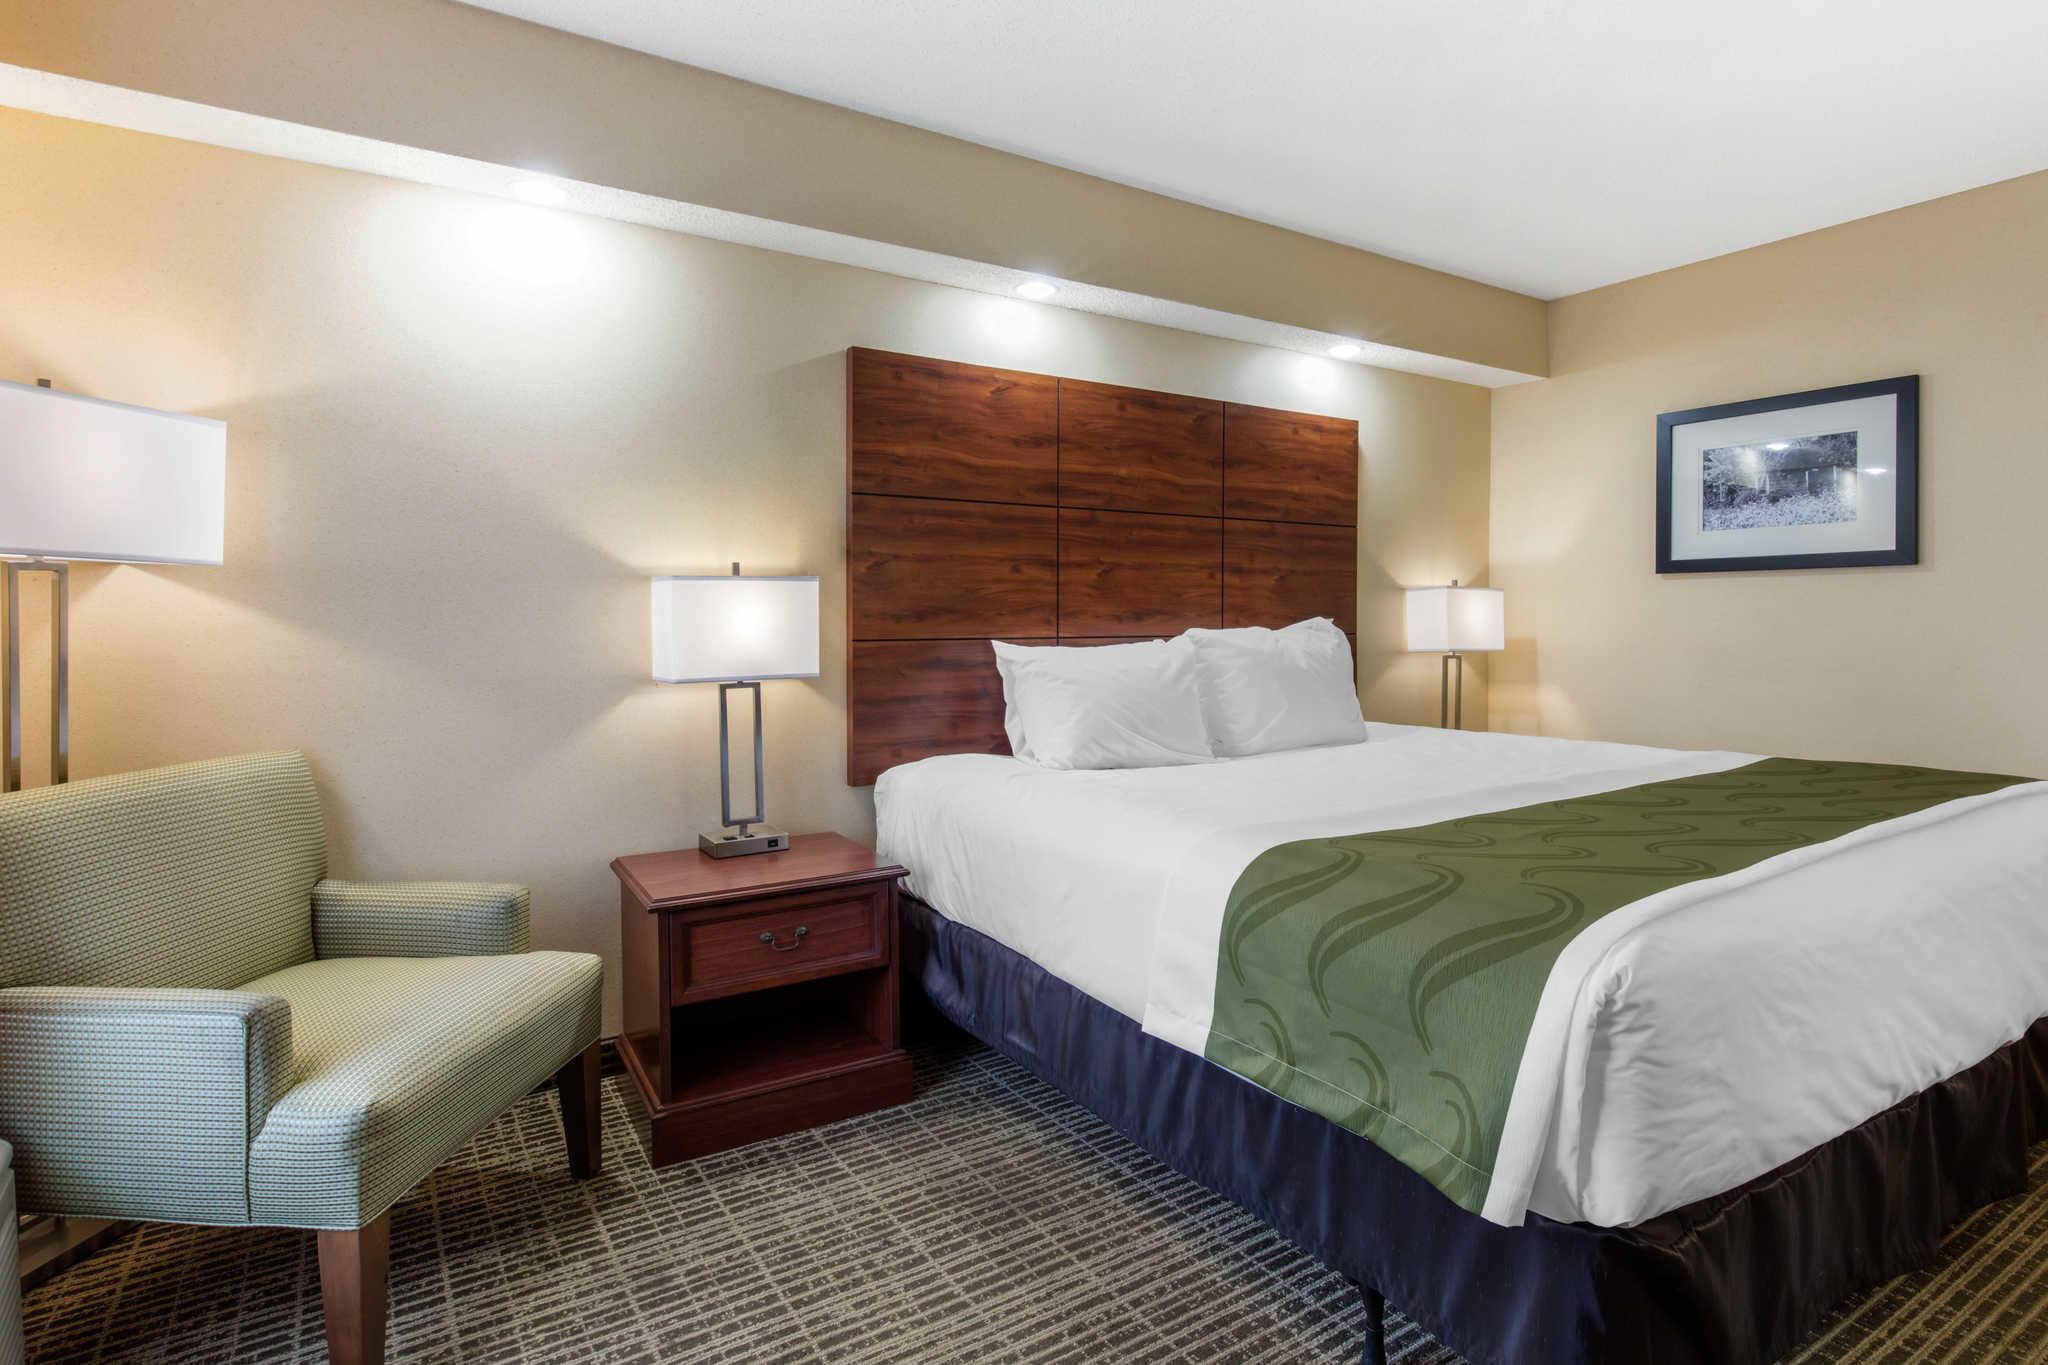 quality inn at 208 micah way scottsboro al on fave. Black Bedroom Furniture Sets. Home Design Ideas